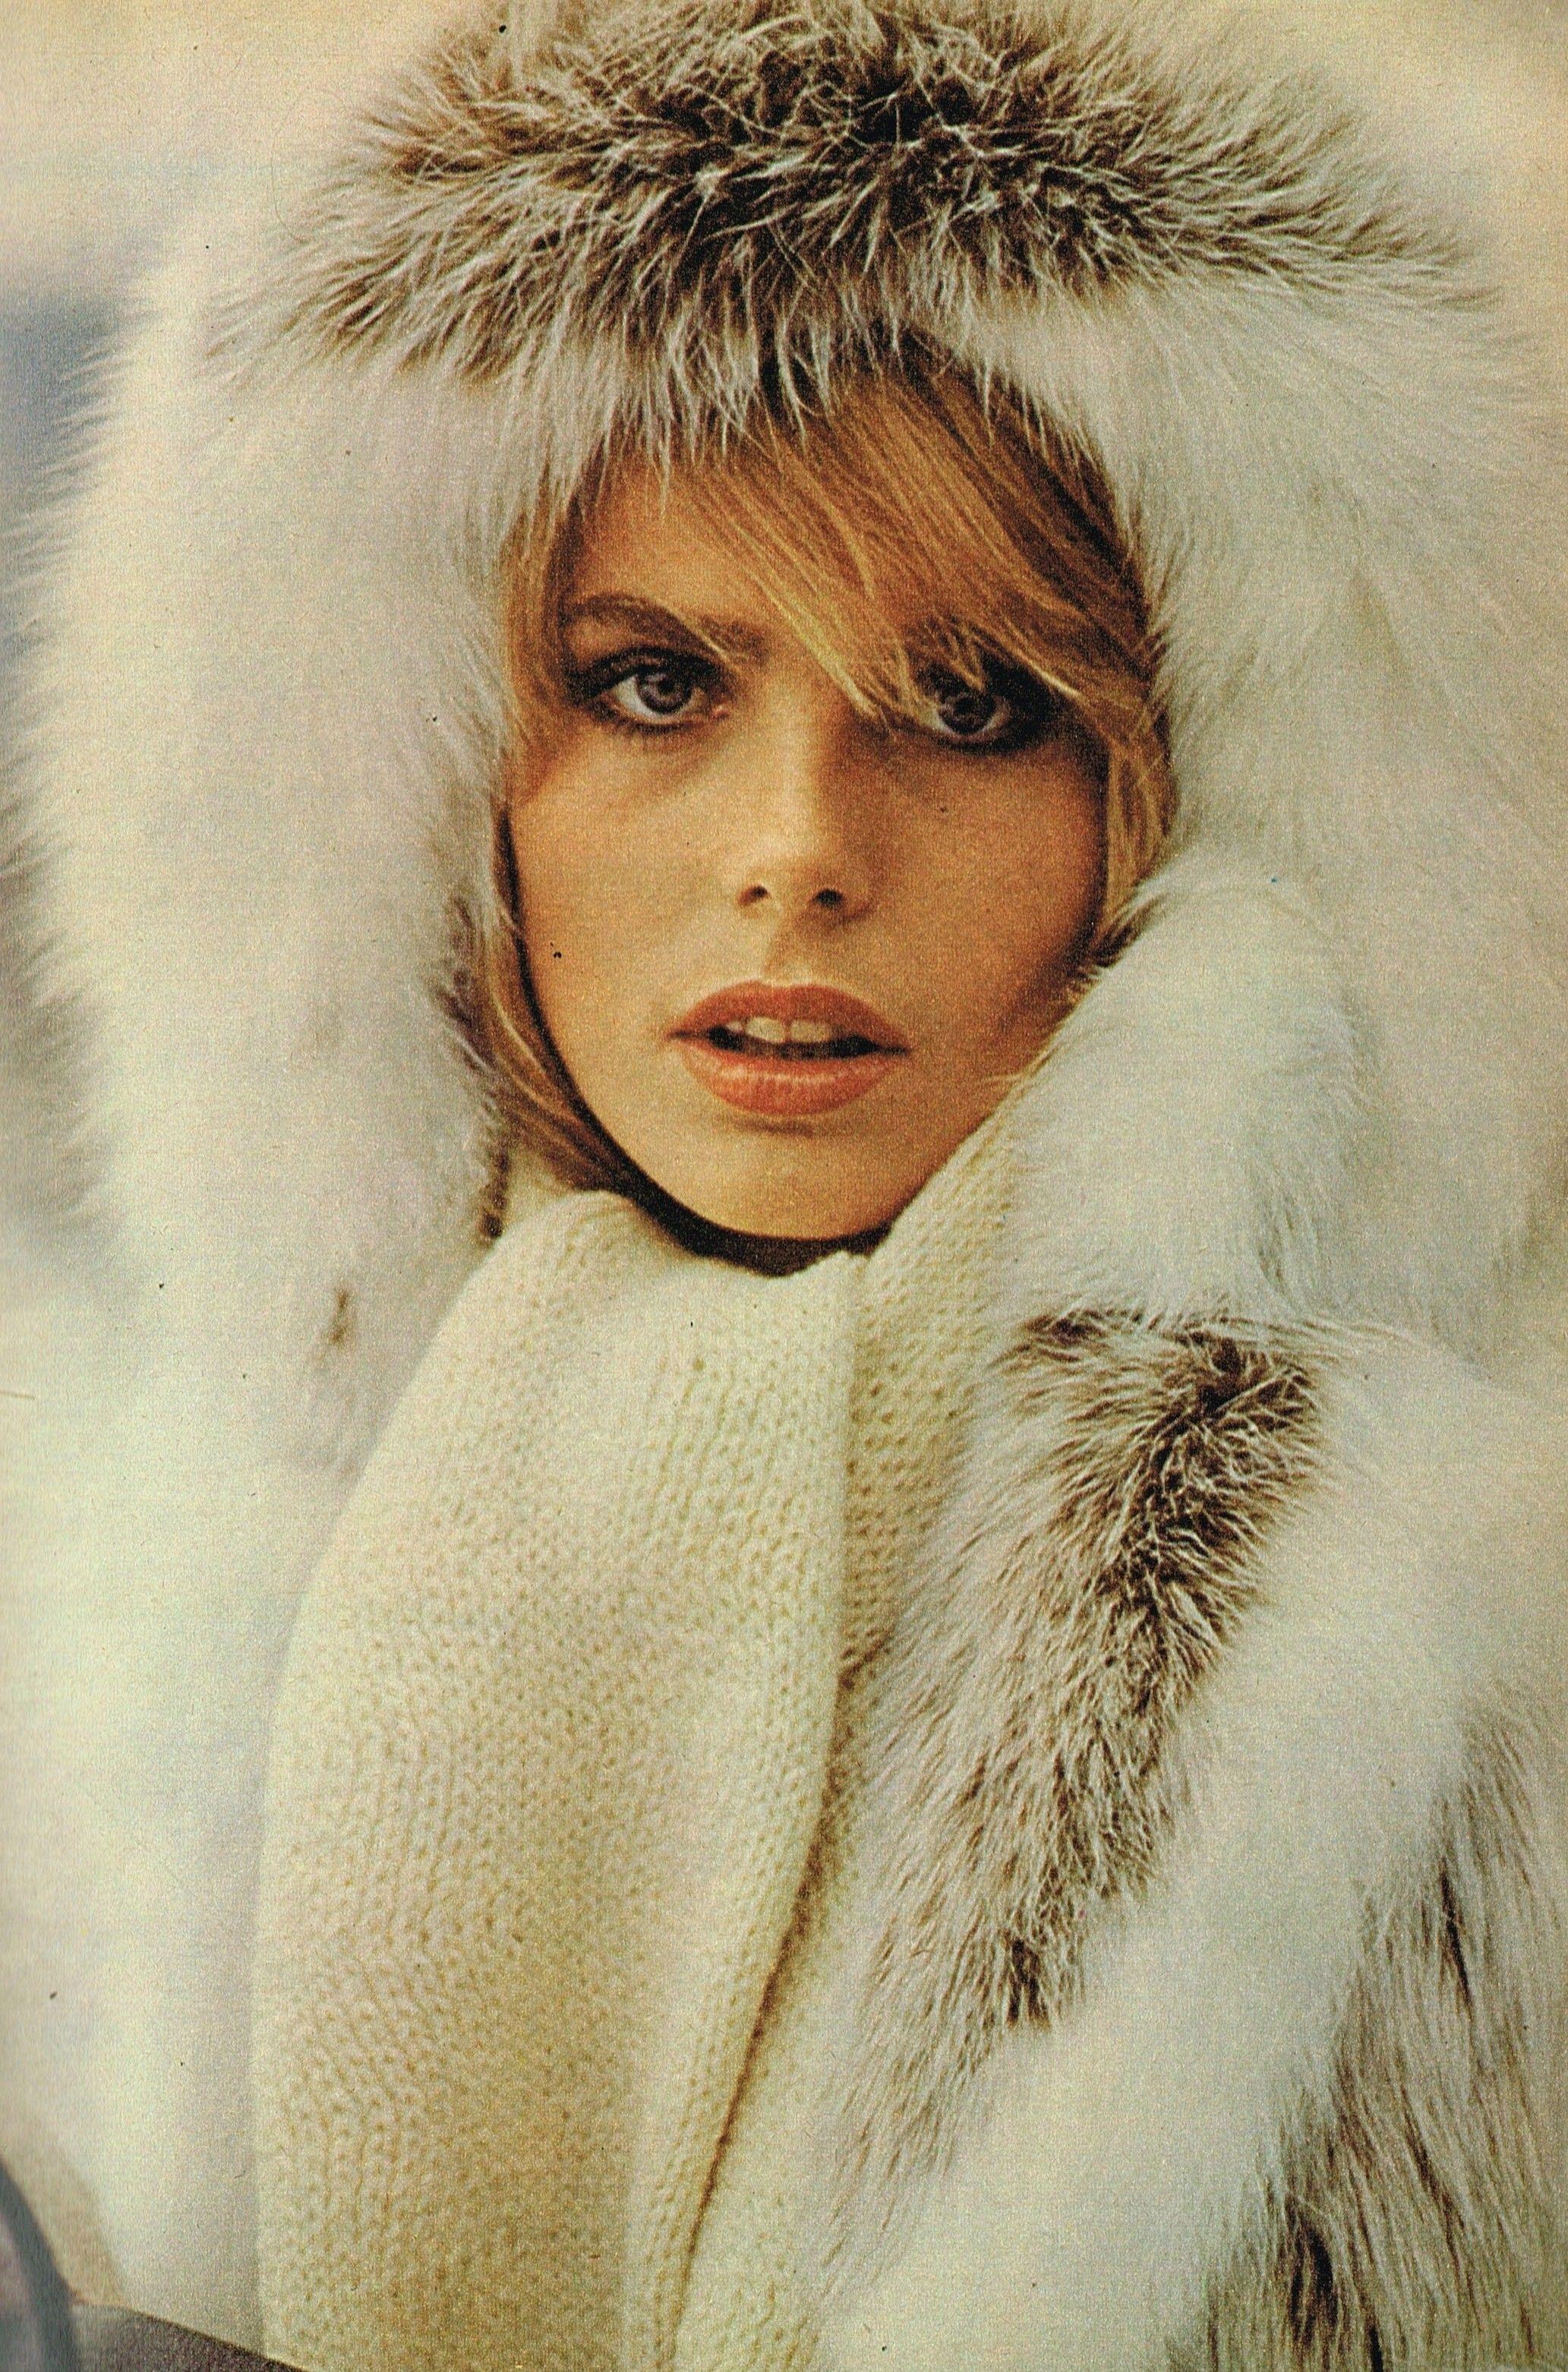 Jaya Ramsey (b. 1969) images